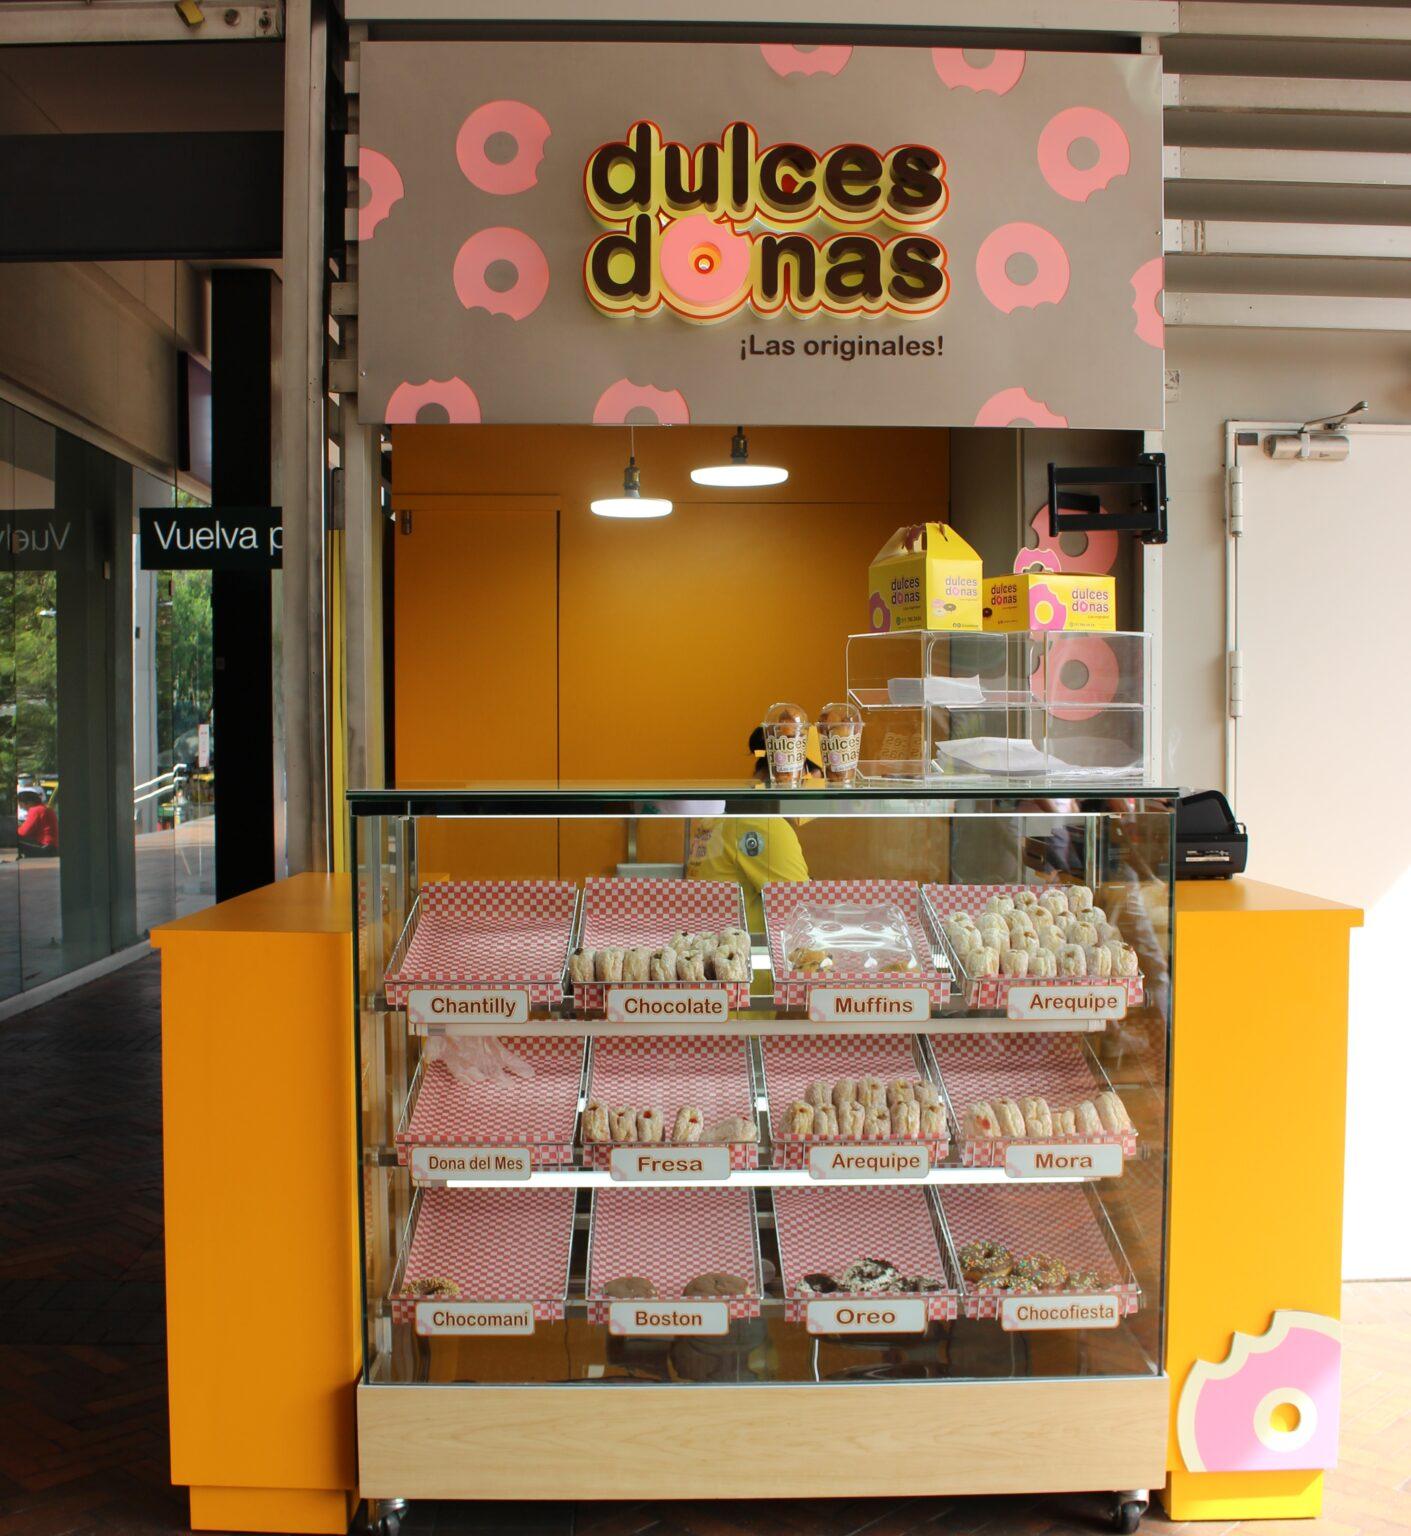 Dulces Donas